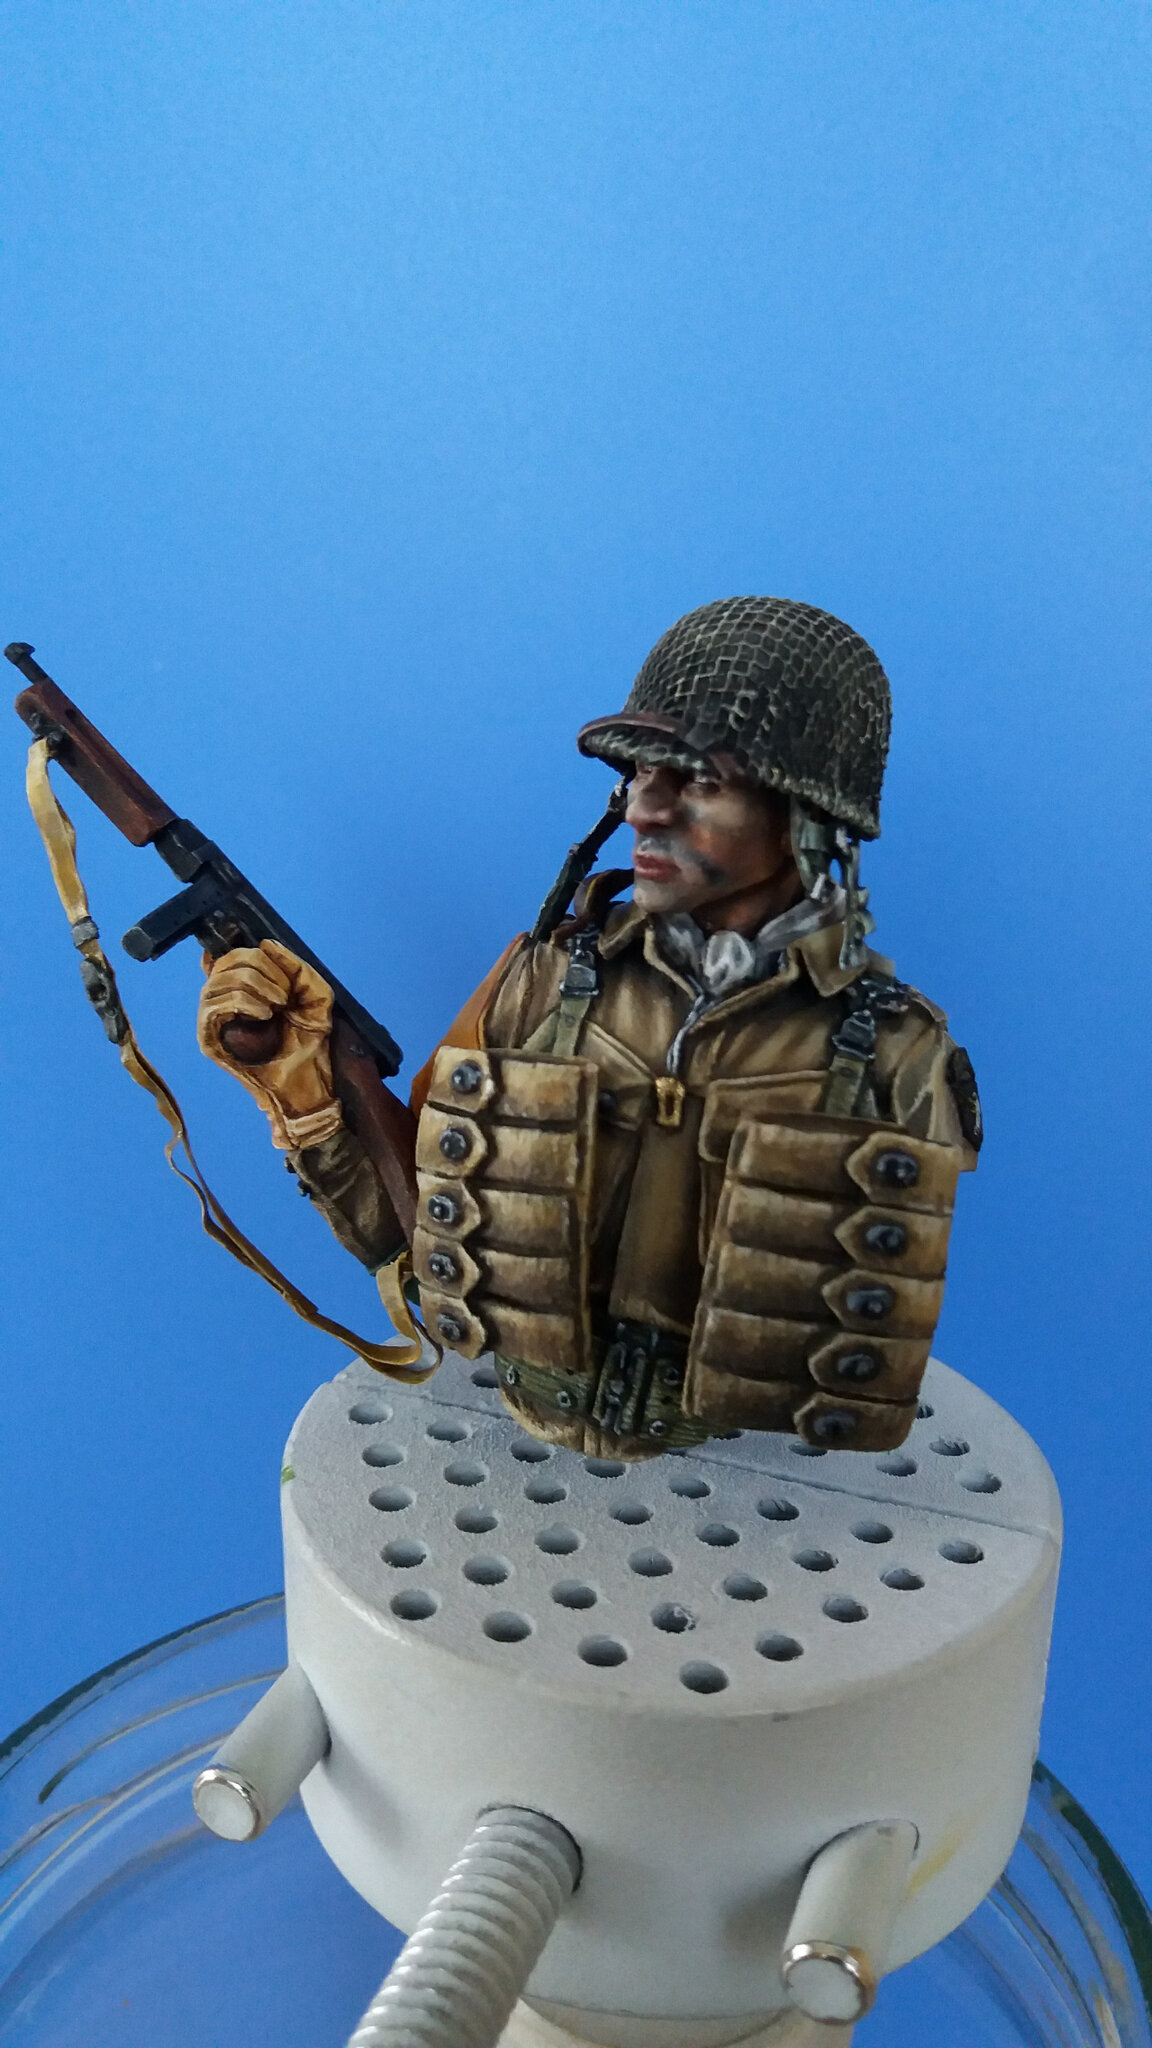 Pathfinder 101eme -1944 - terminé 111655787_o